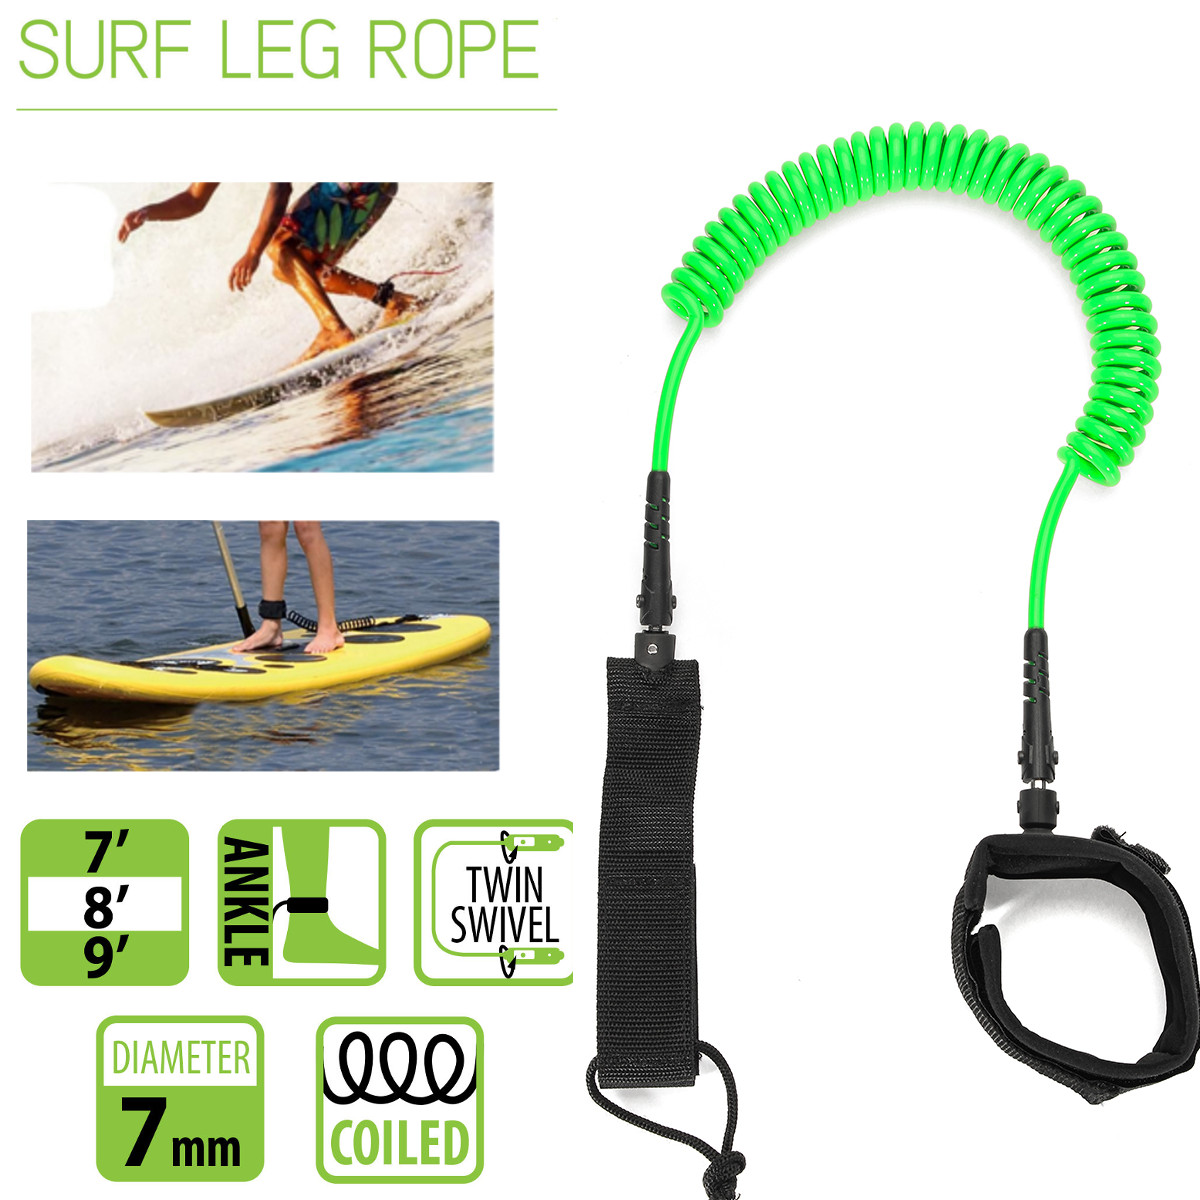 5ft Orange Straight TPU Surfboard Leash Surf Board Leg Rope 7mm Thickness